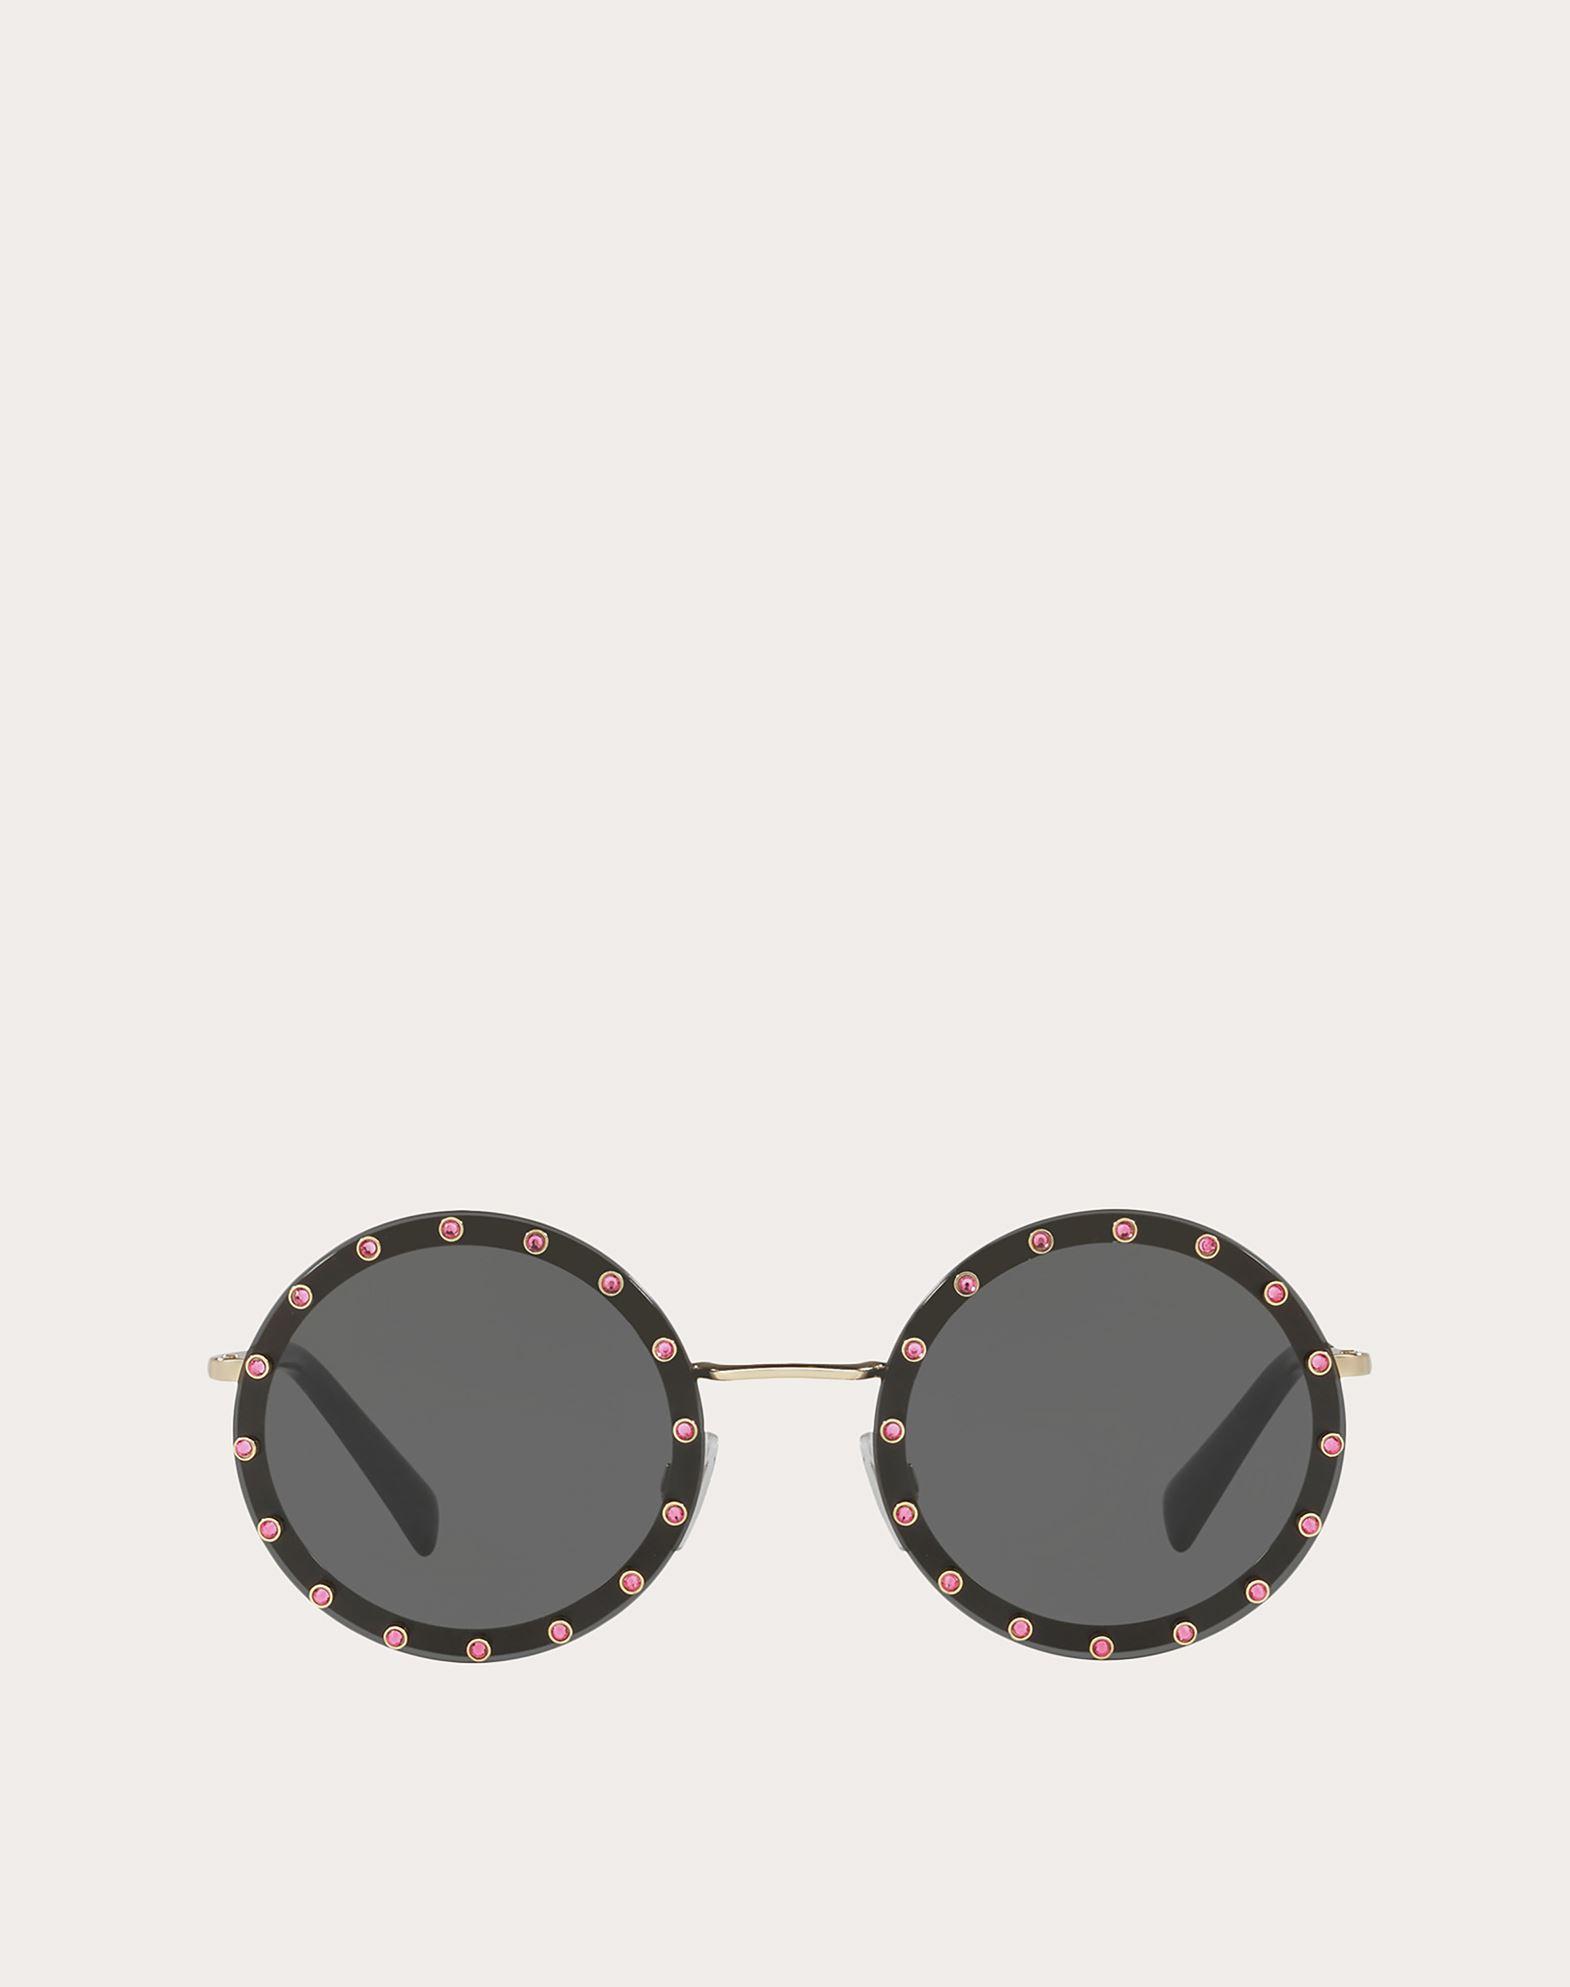 VALENTINO Logo Solid color Metallic/plastic frame Round lenses  46541590pu